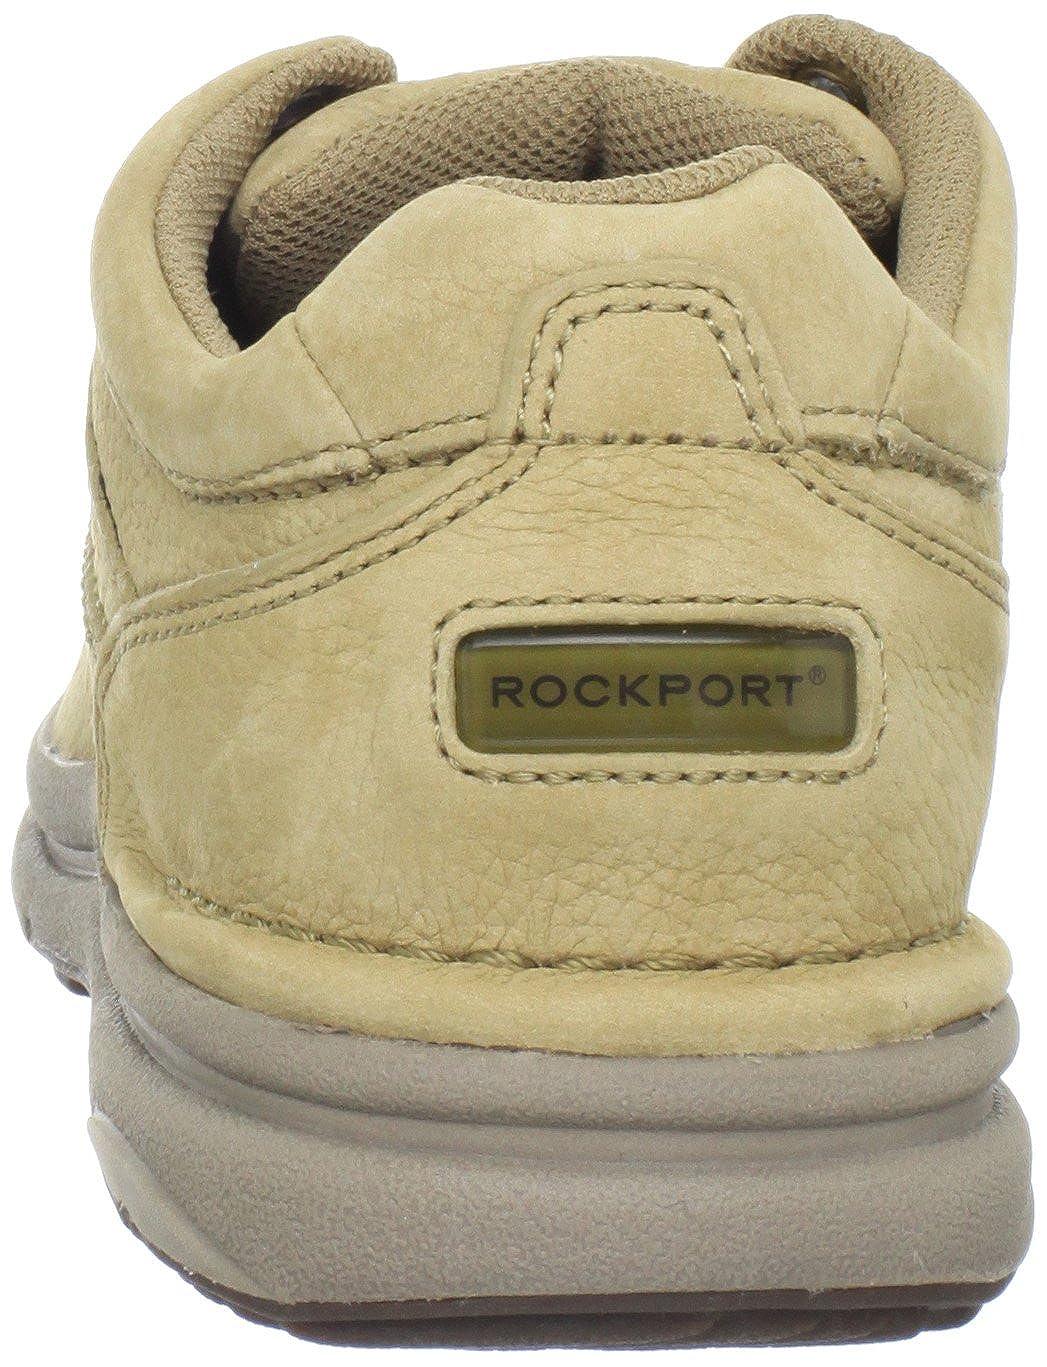 Rockport World Tour Classic K711 K711 K711 Herren Halbschuhe B0062638SM  0a7a5c